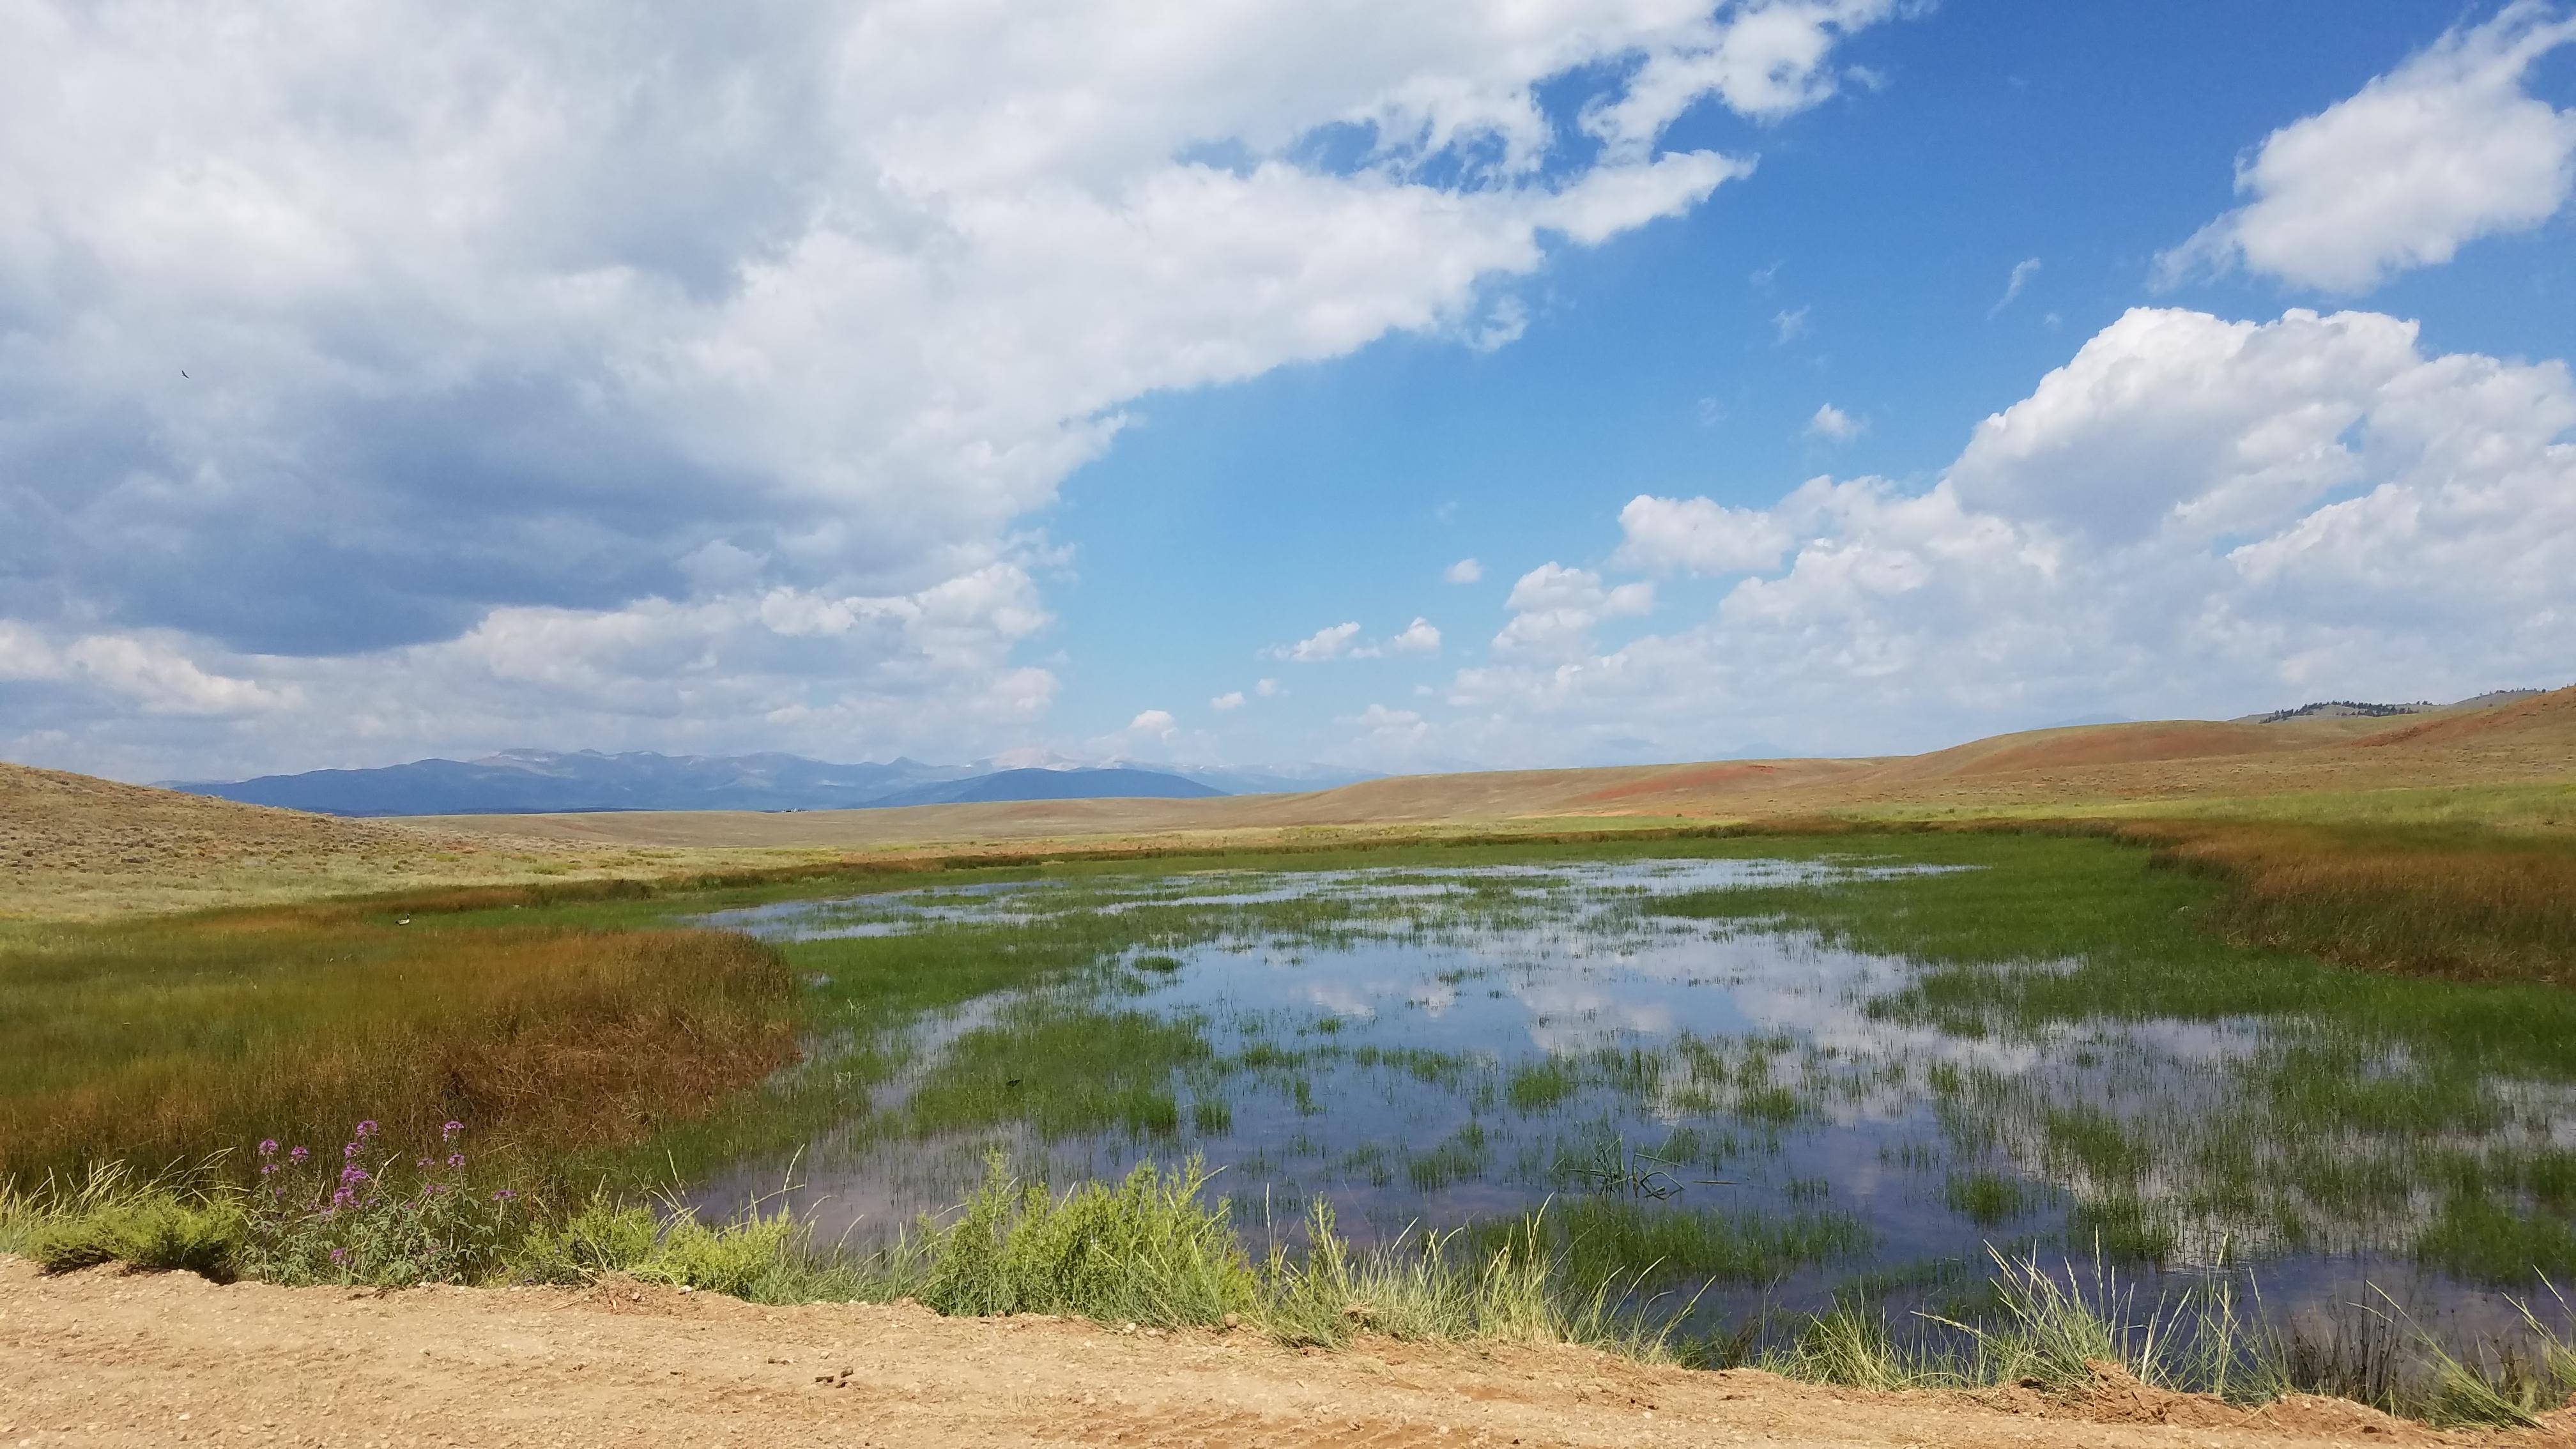 Wetlands area near Antero Reservoir